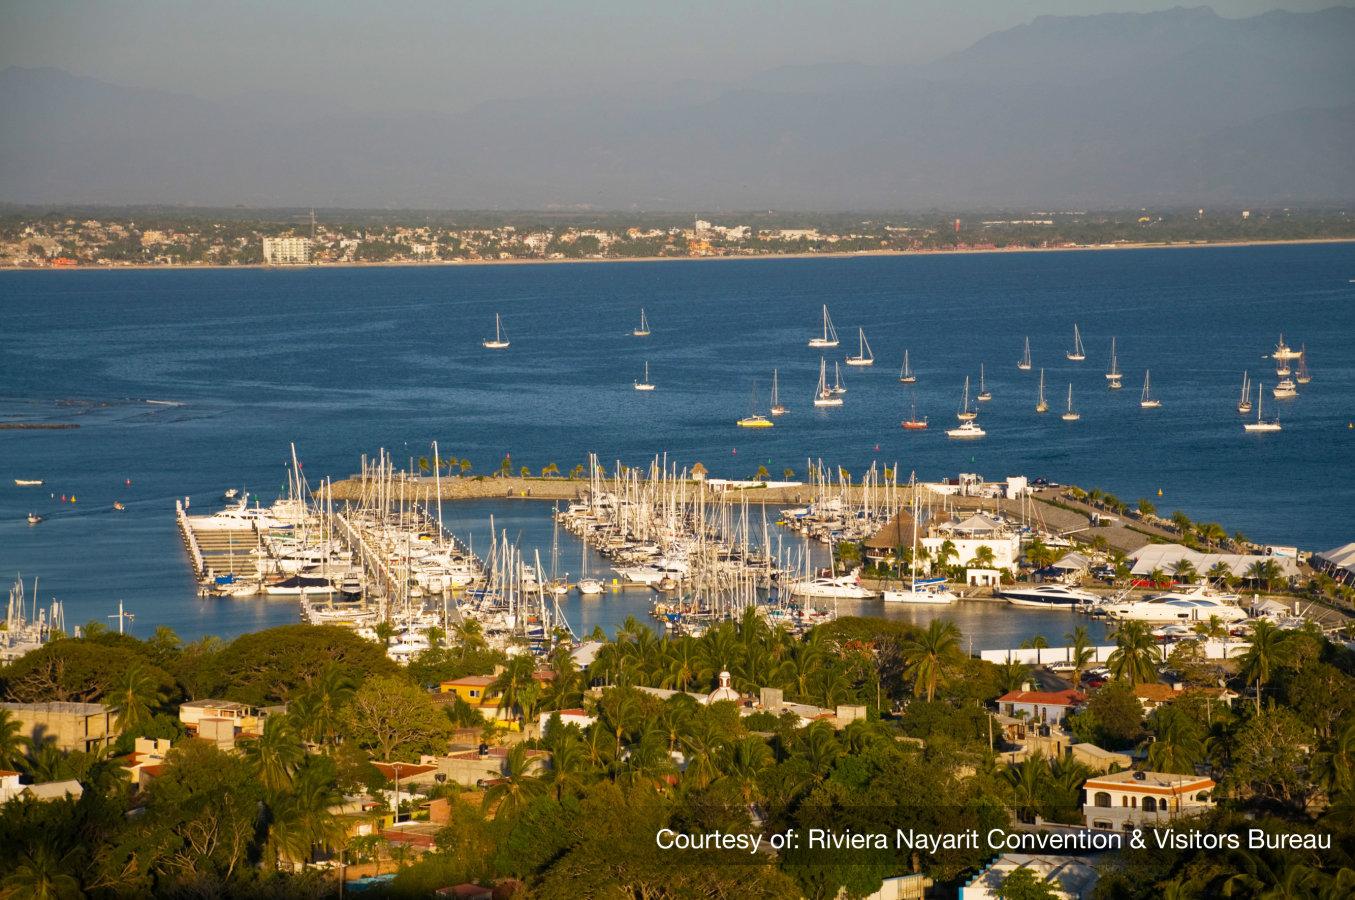 Riviera Nayarit, a favorite destination by celebrities in 2015